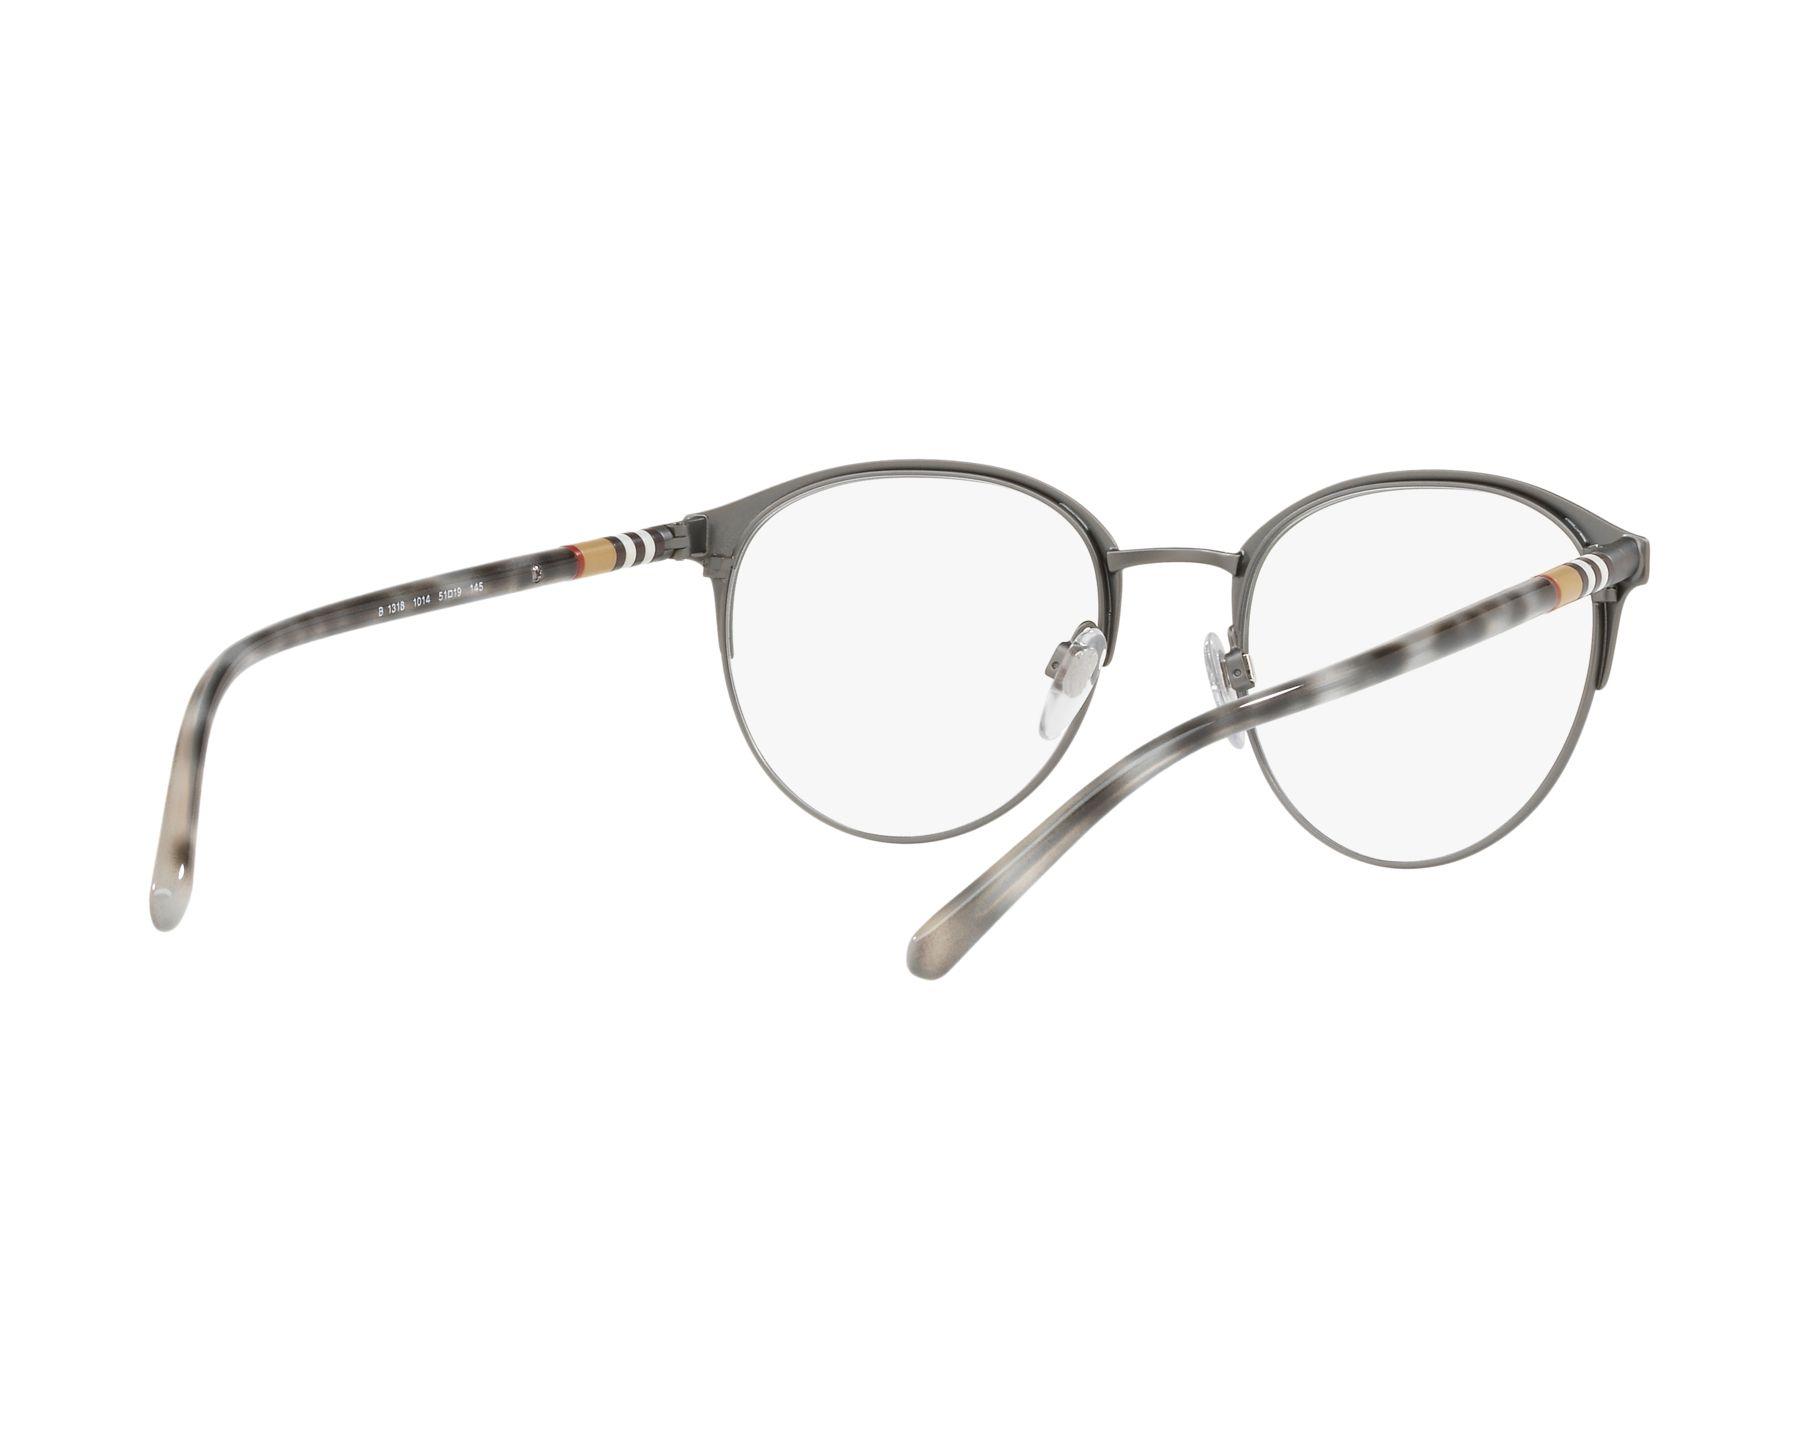 eyeglasses Burberry BE-1318 1014 51-19 Gun Grey 360 degree view 8